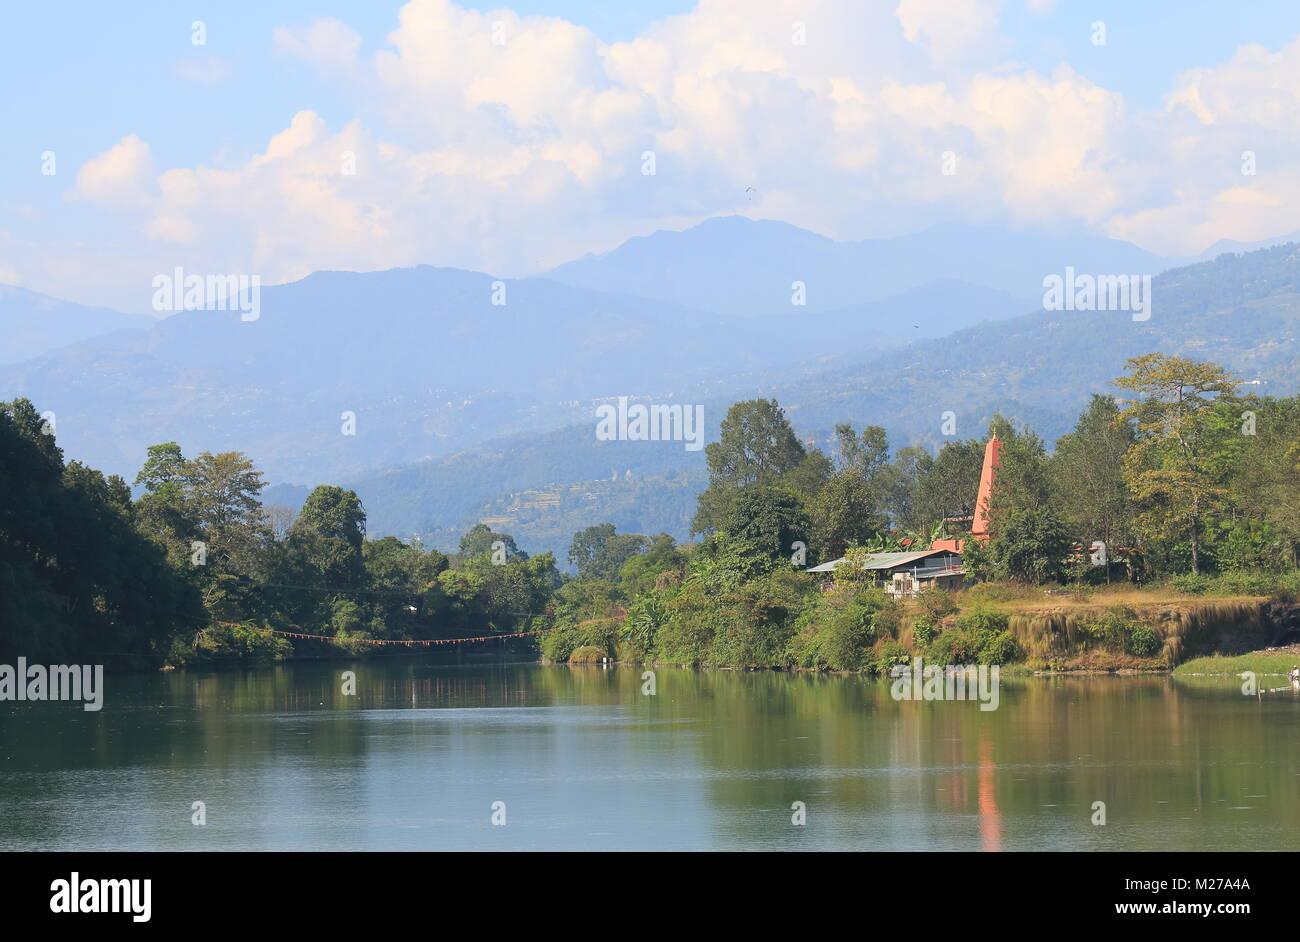 Dam Side Park landscape in Pokhara Nepal. - Stock Image